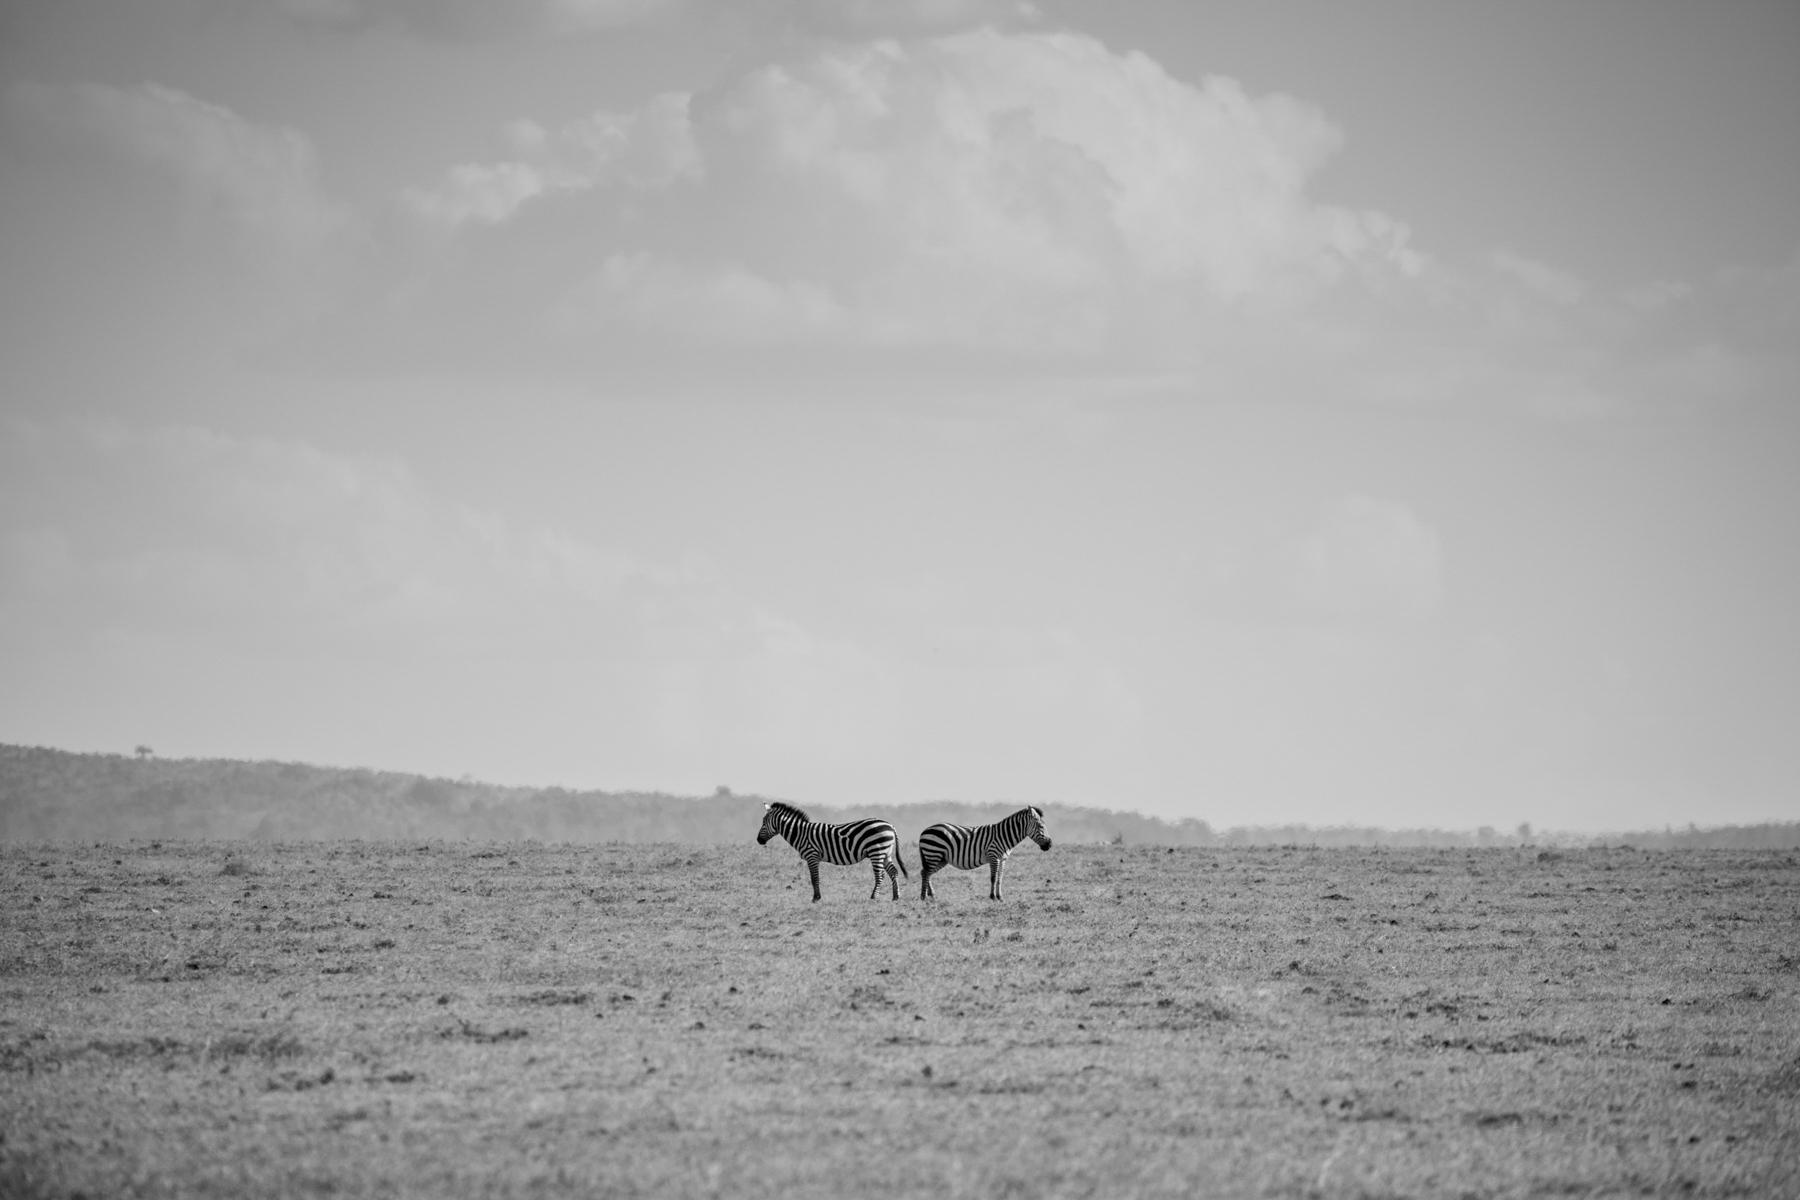 KenyaFeb2019_Safari-111.jpg